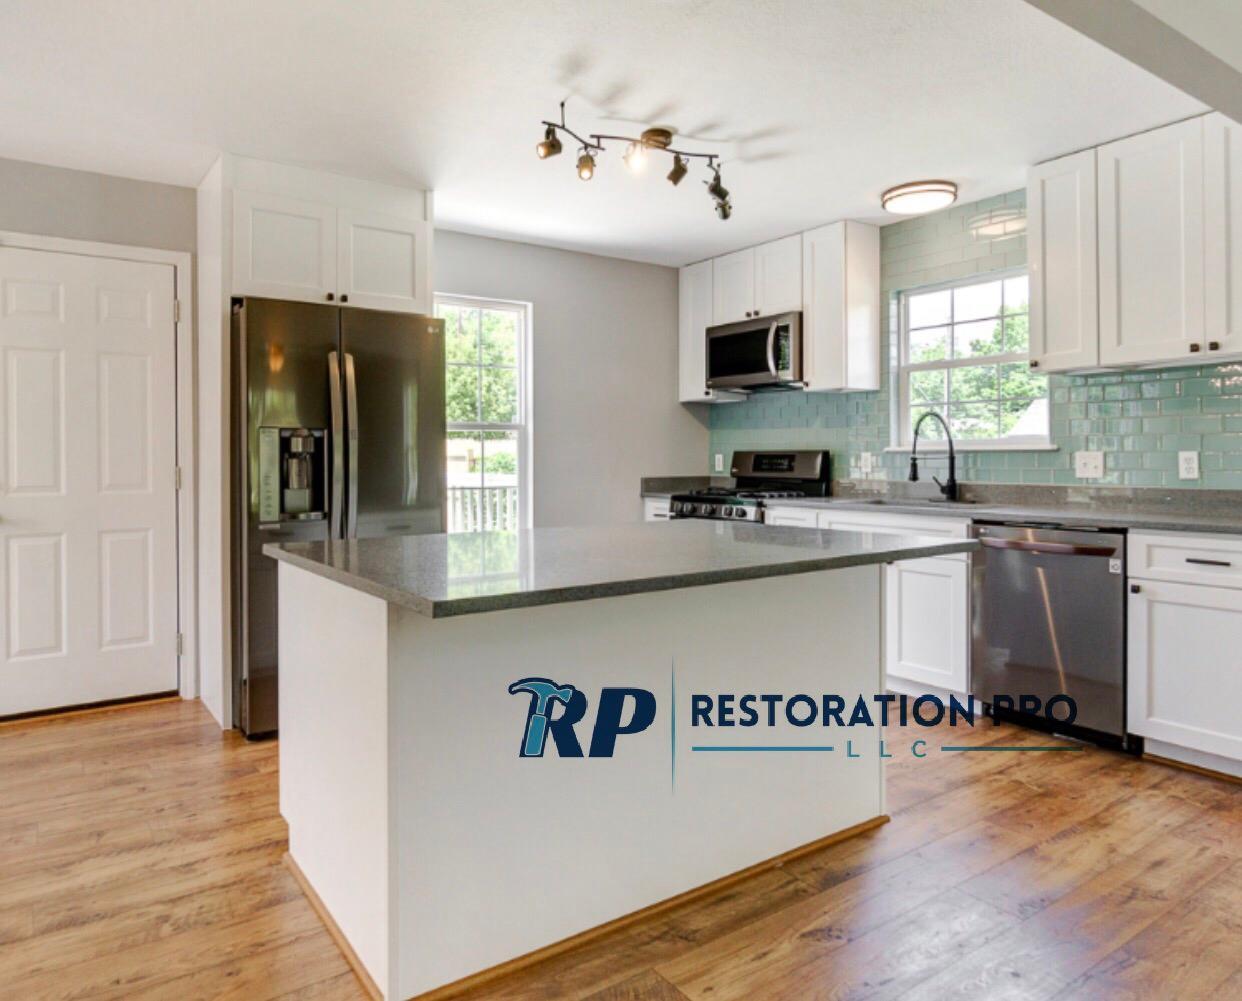 Restoration Pro LLC image 11